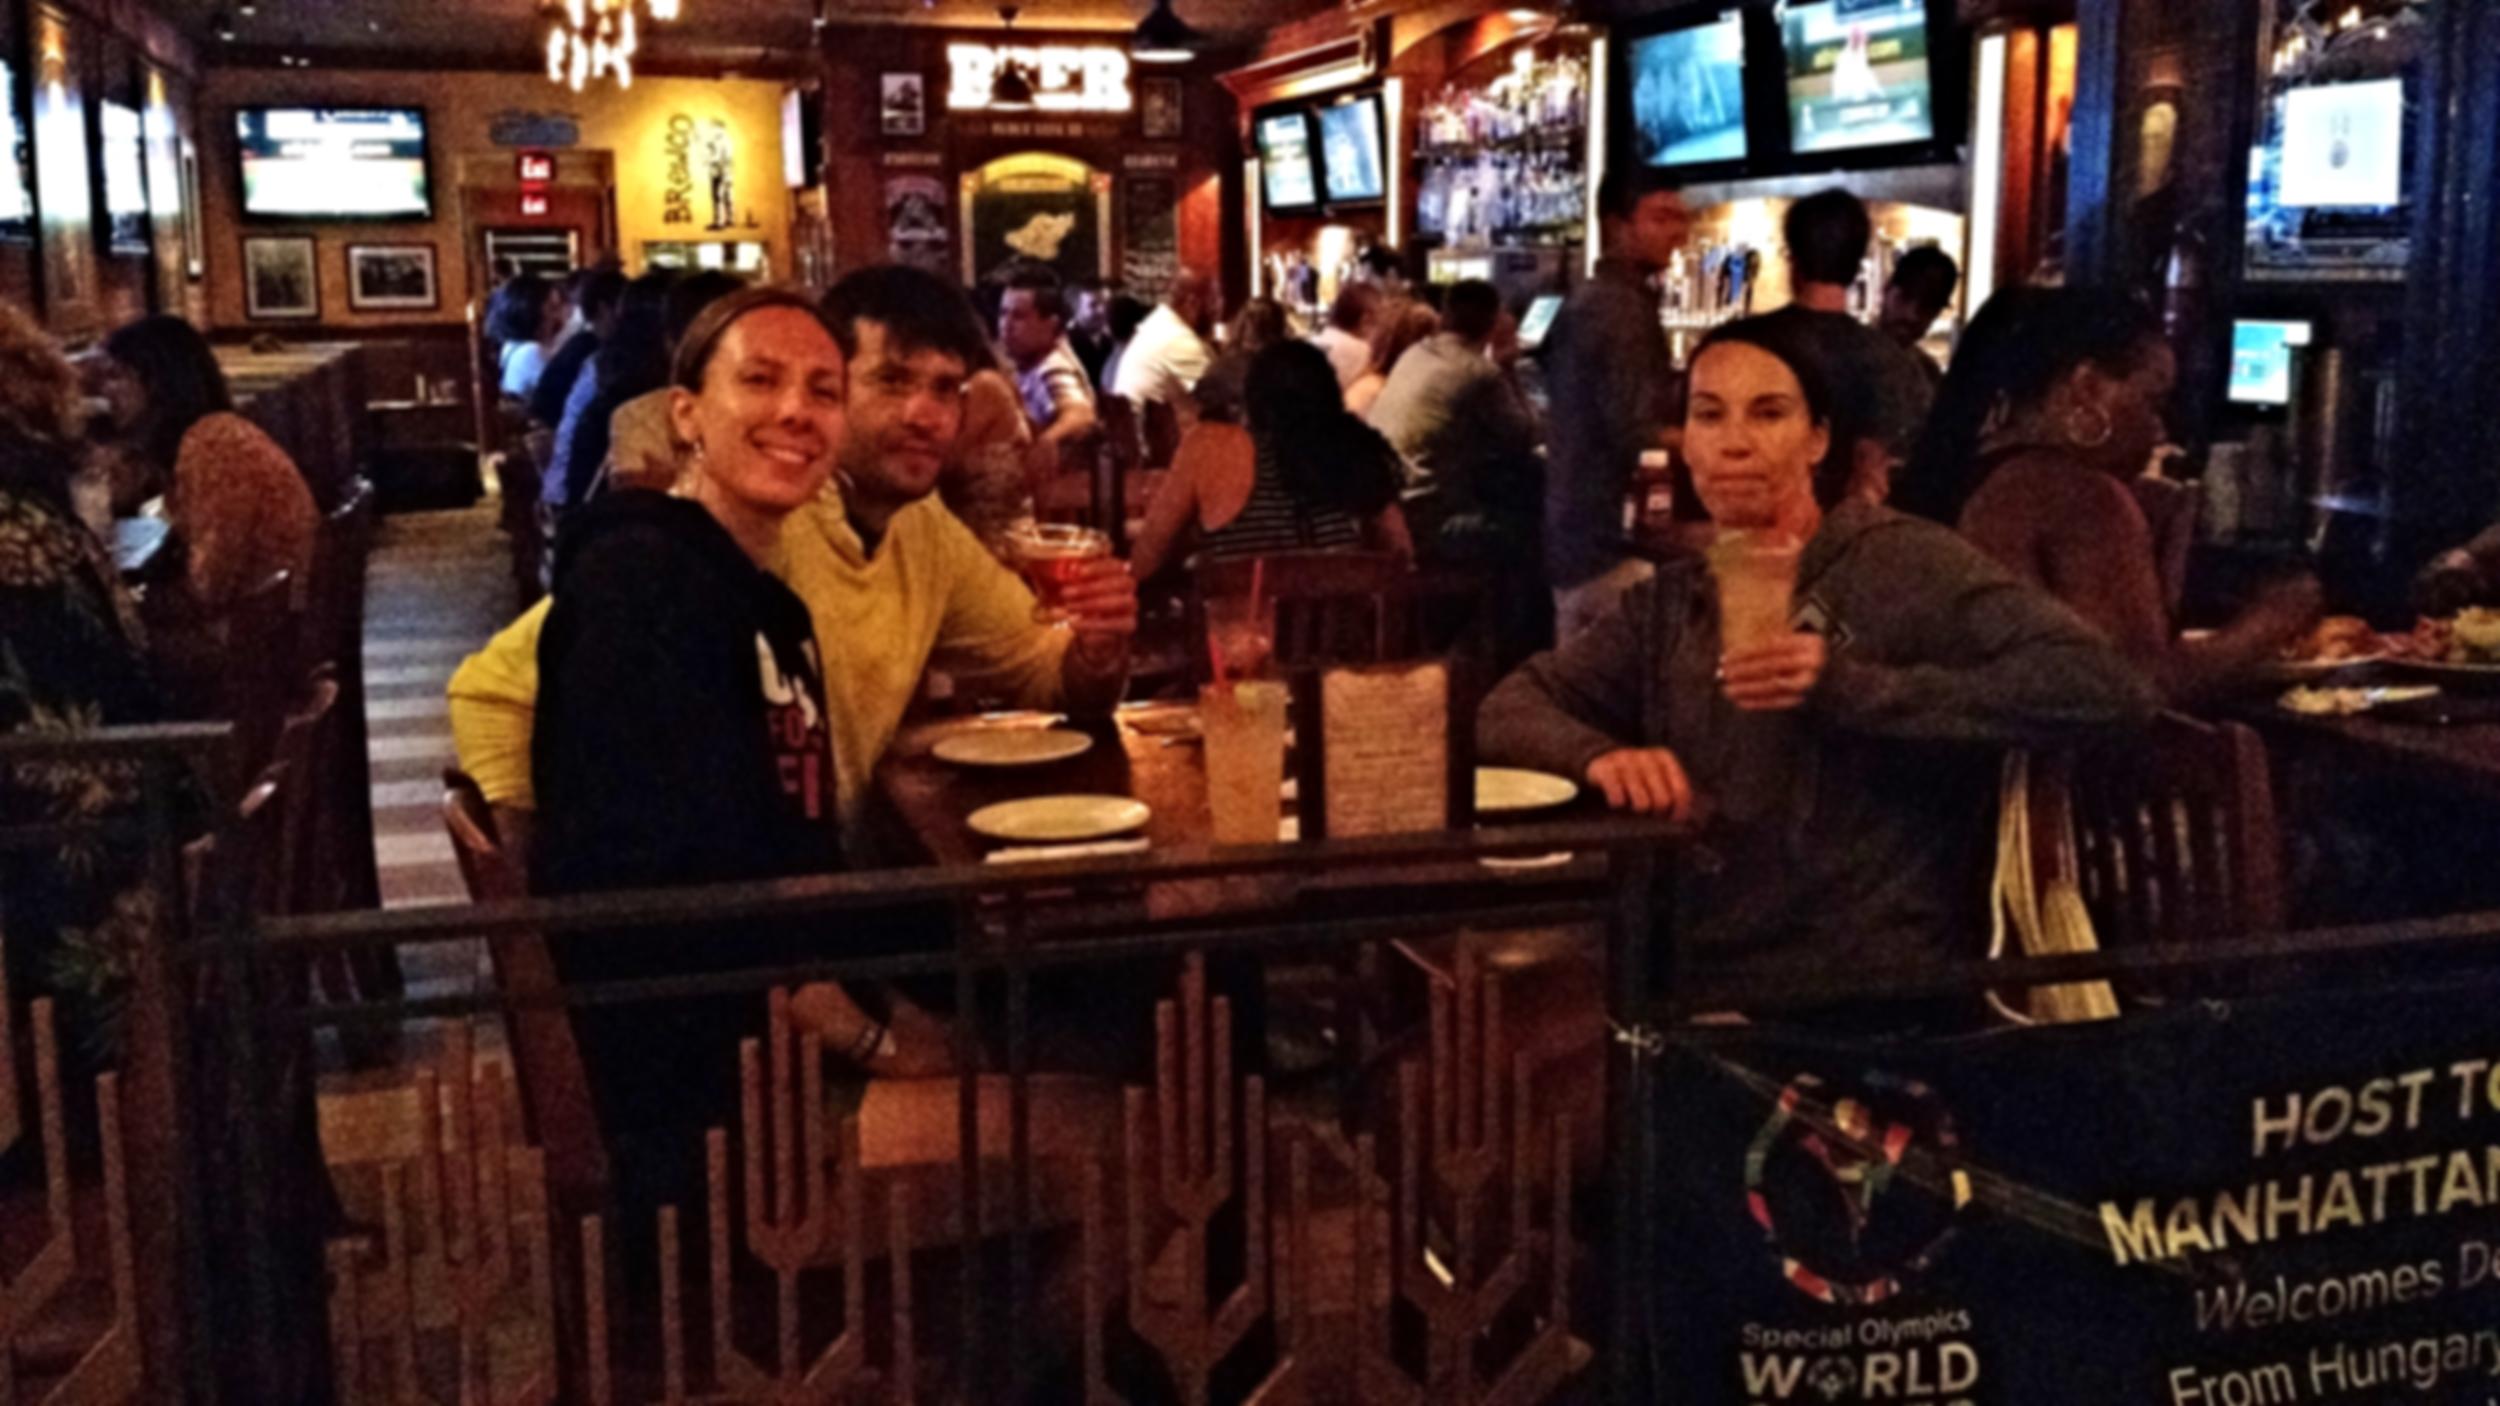 After a long week of CrossFit Games WORK, coach Andréa enjoys a well deserved Margarita with good CFSV friends!!!